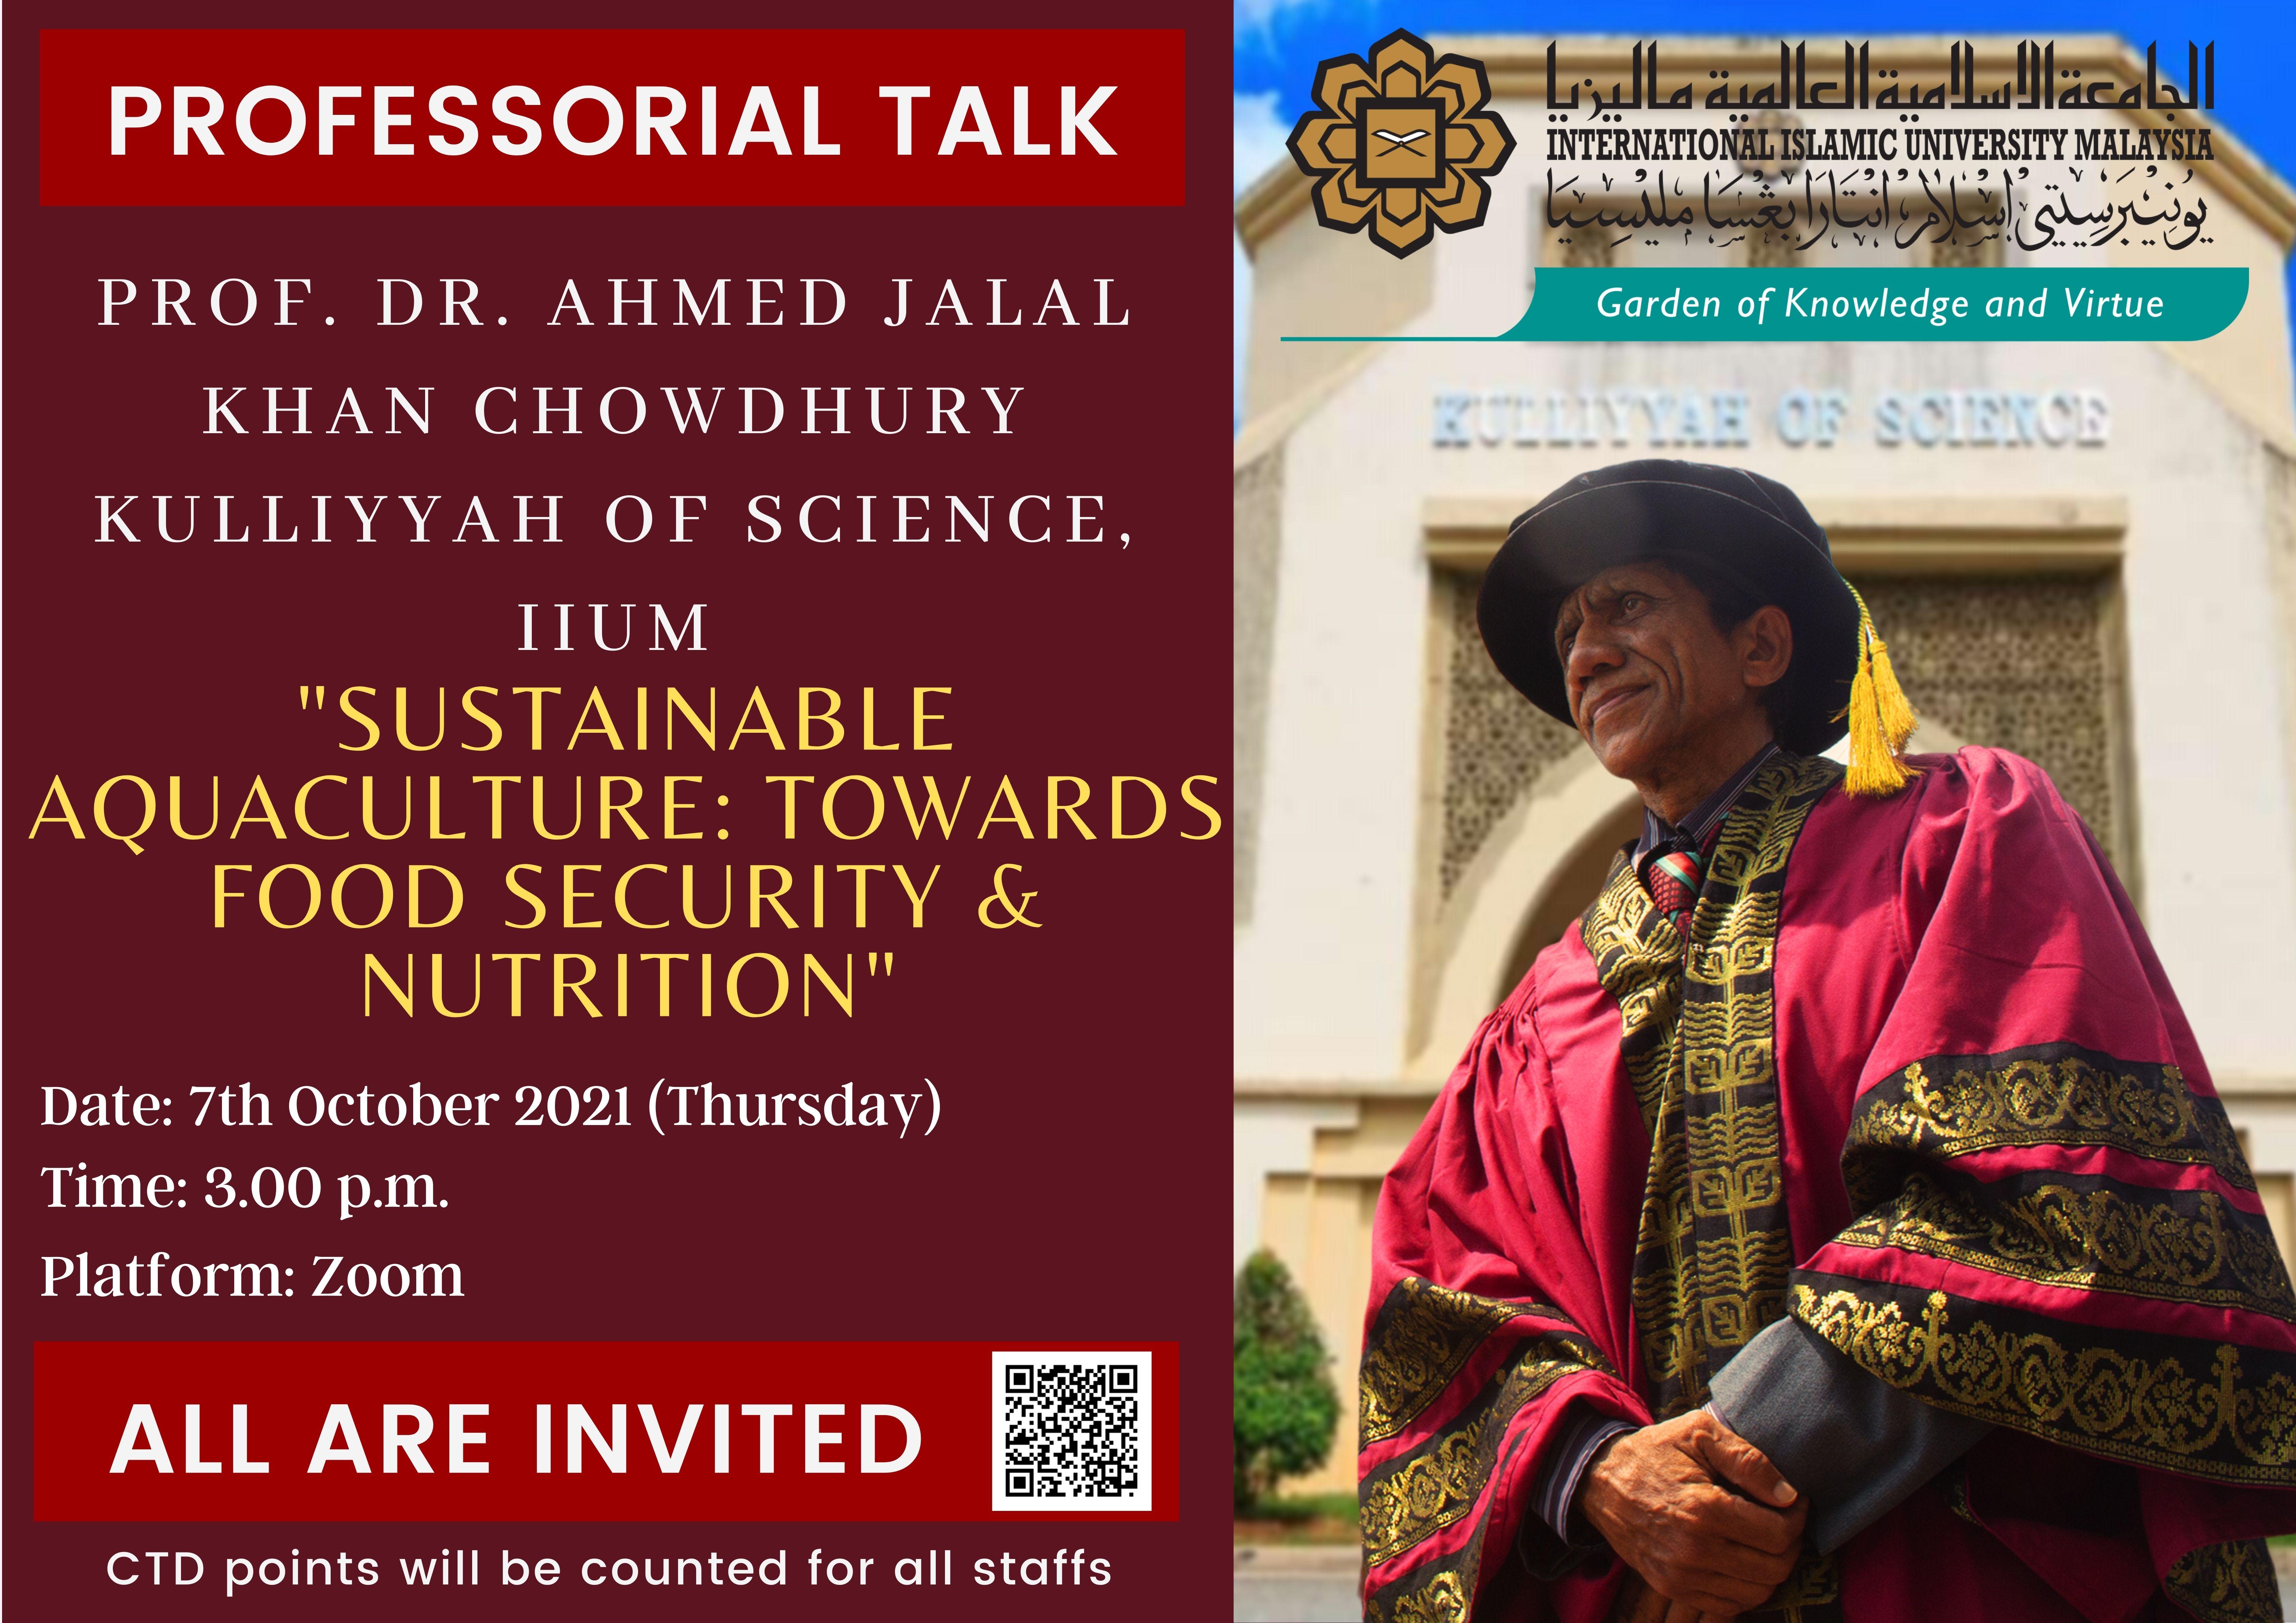 PROFESSORIAL TALK BY PROF. DR. AHMED JALAL KHAN CHOWDHURY